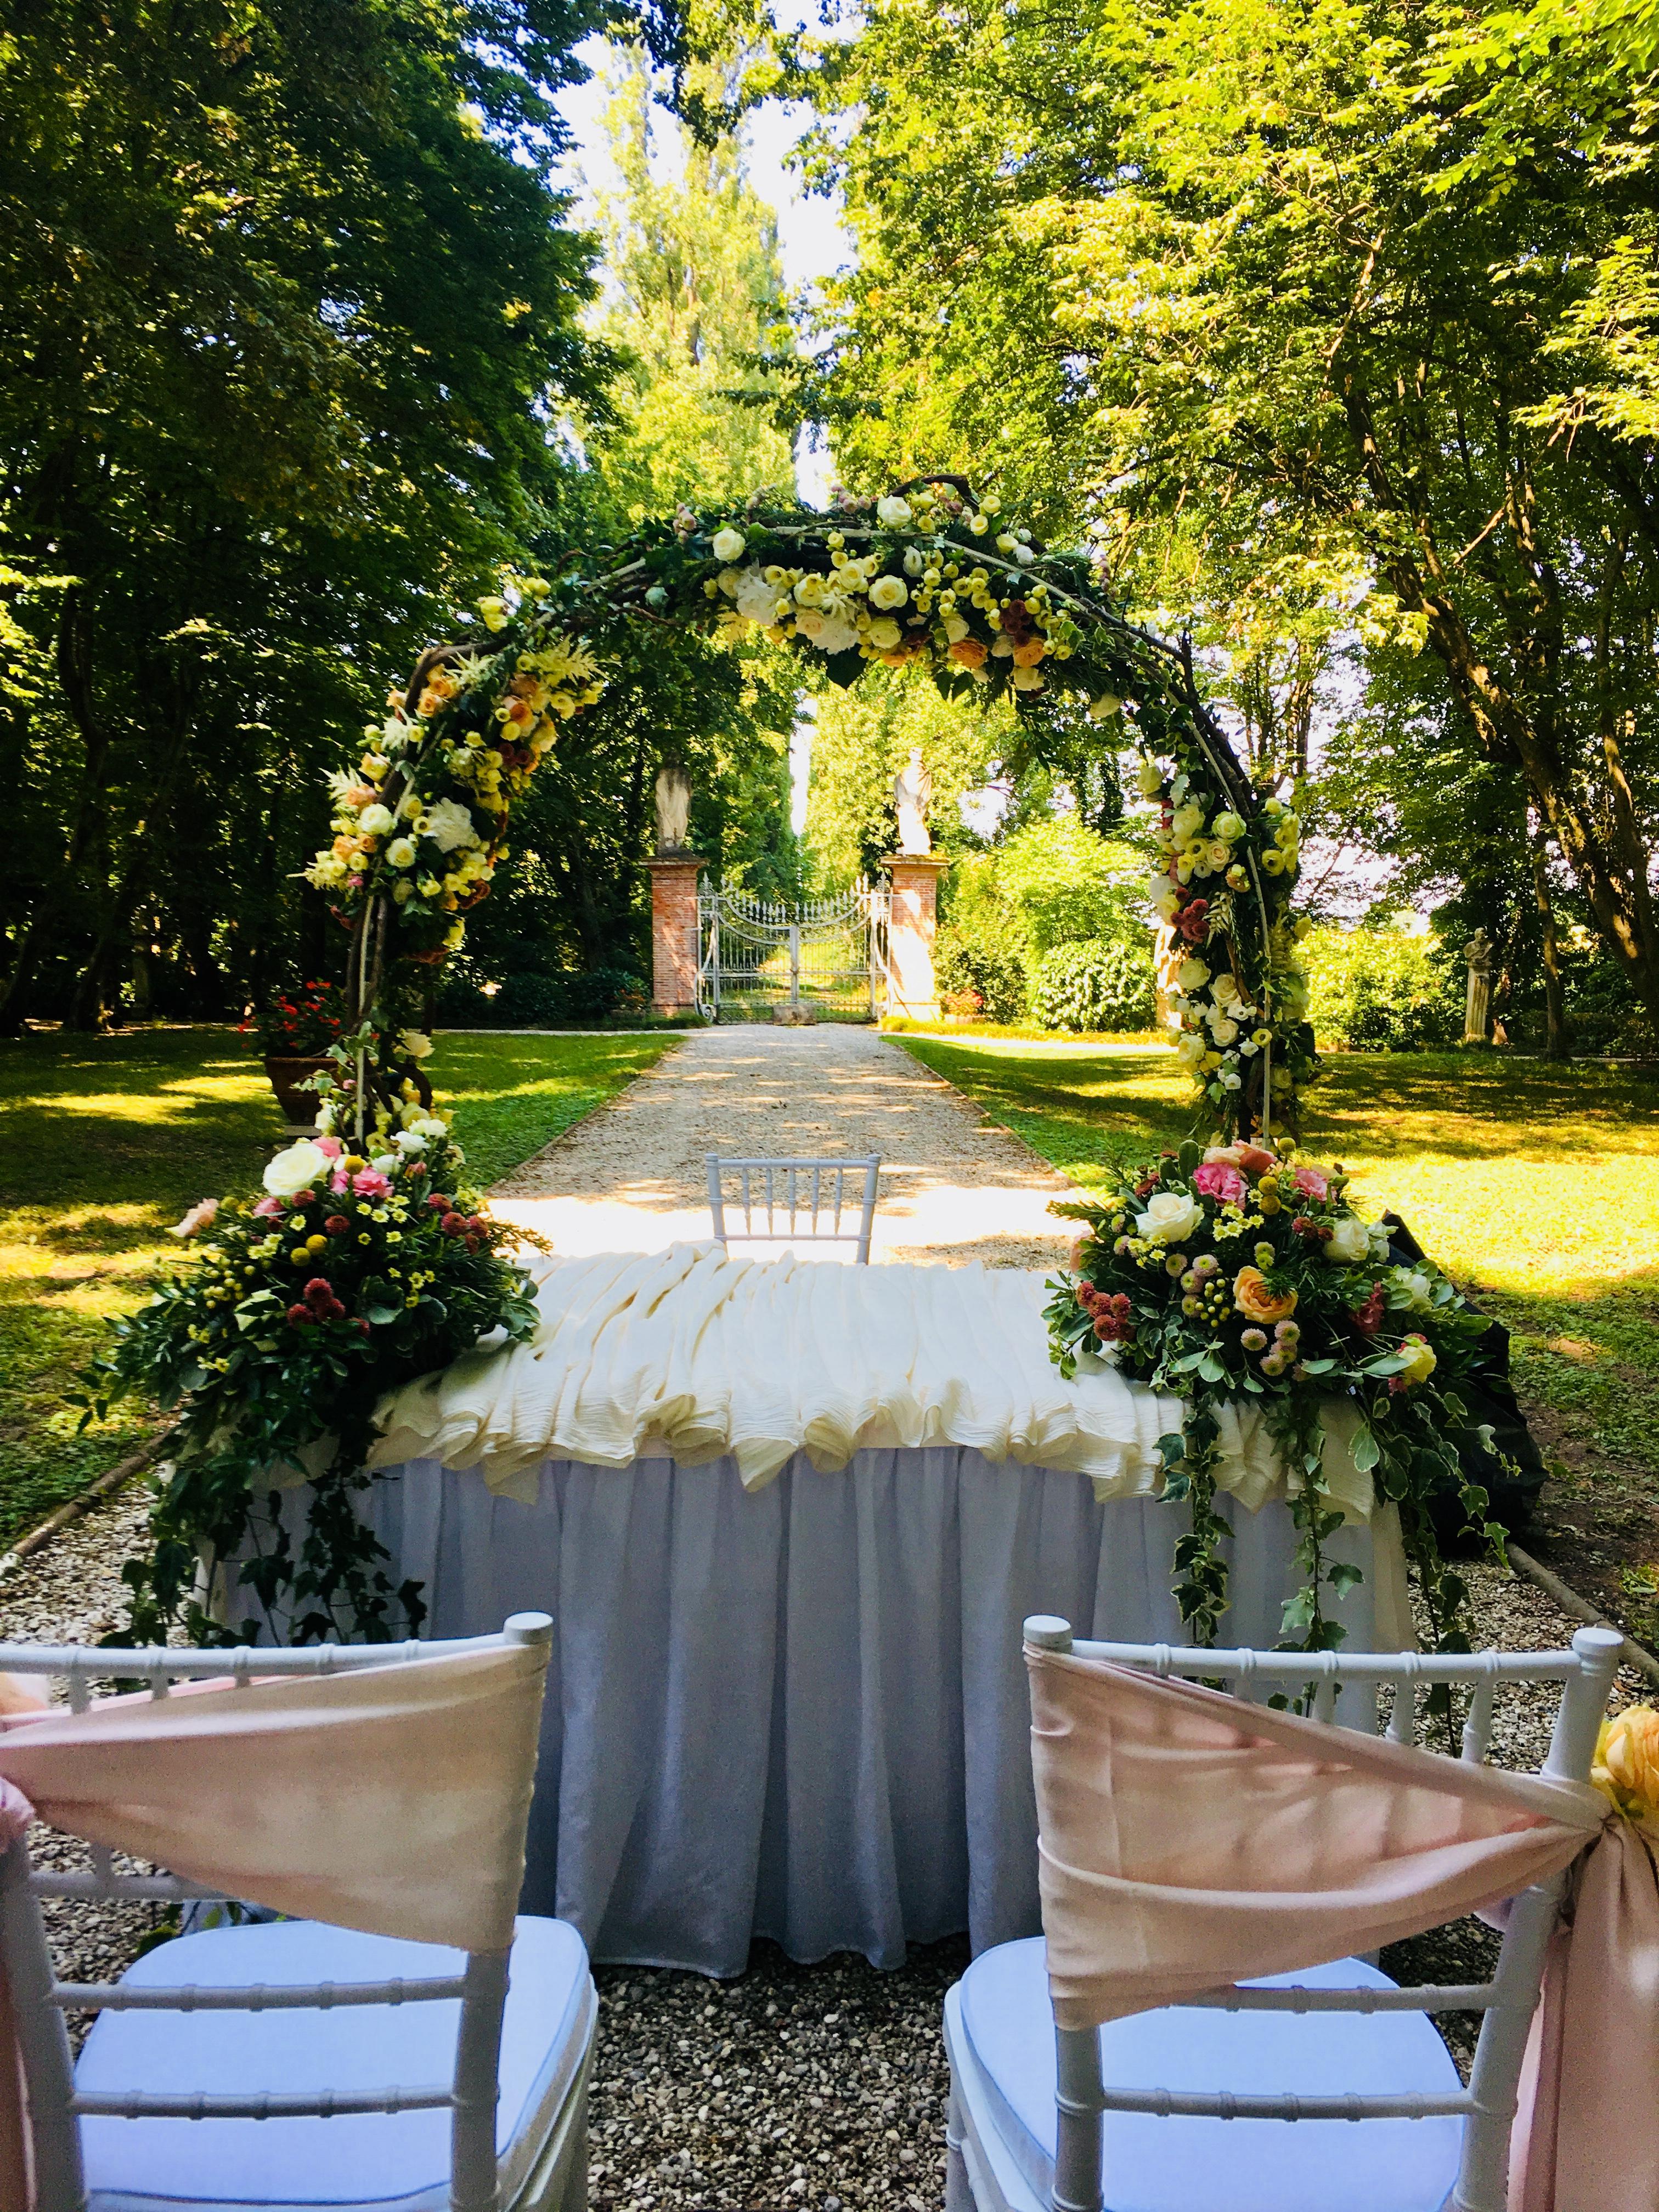 #samuelbarbiero#3difiori#flowerparty#floralarrangements#partydecorations#flowerspadua#floralmood#pad